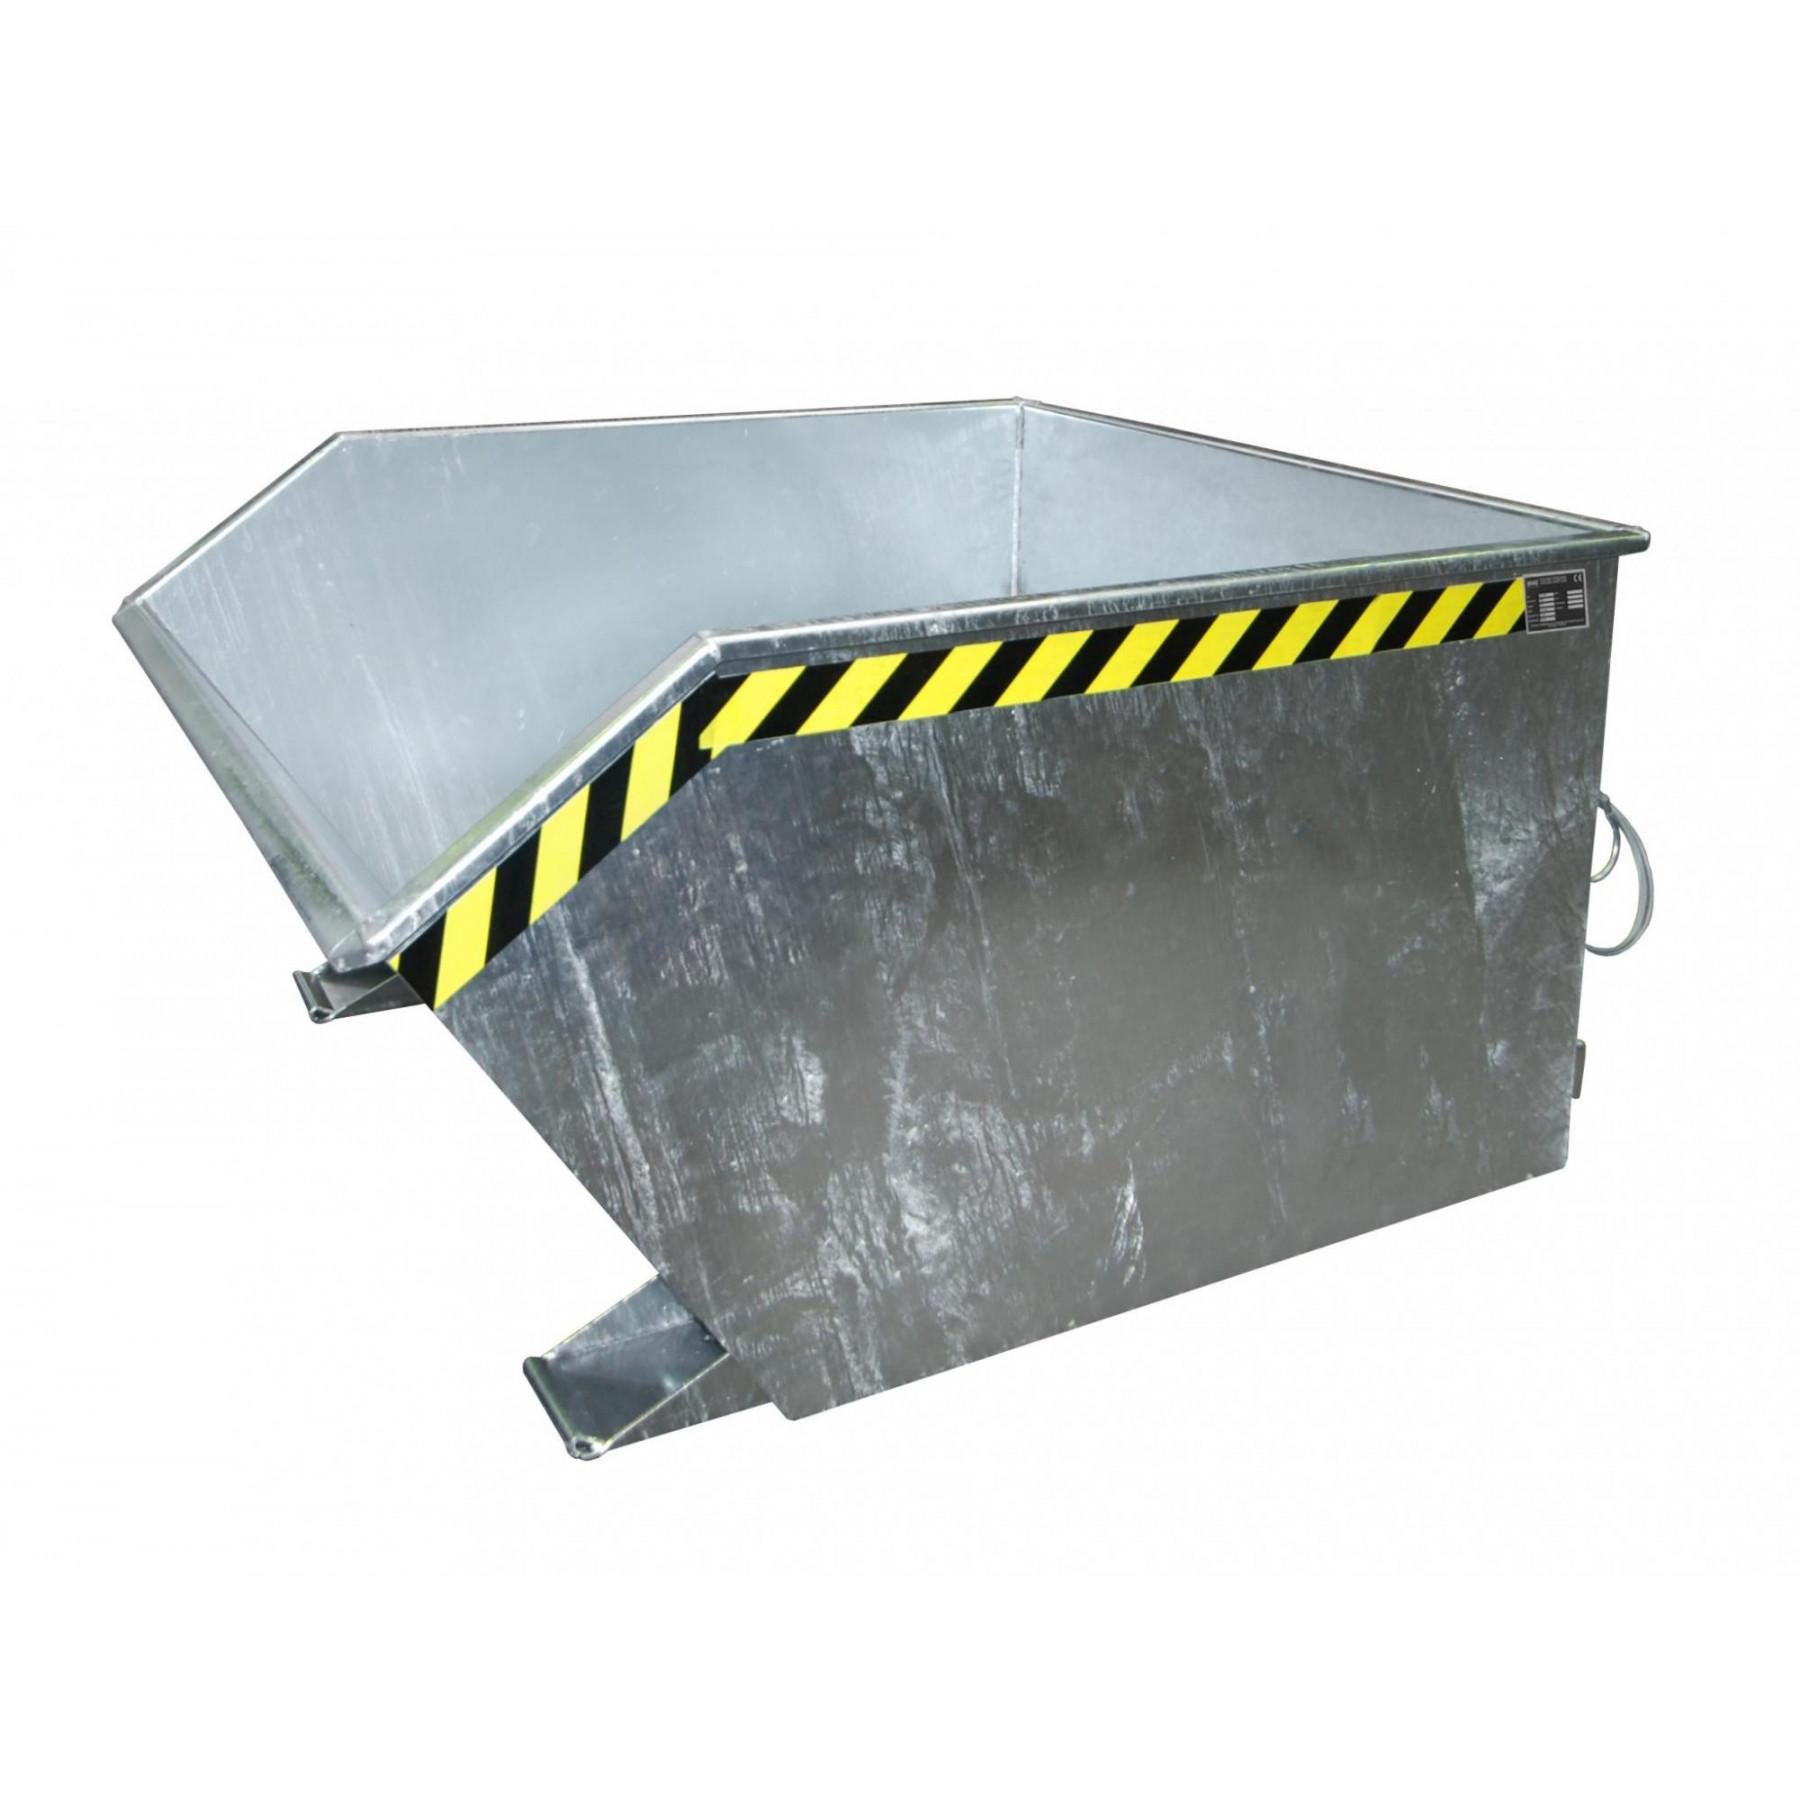 Kiepcontainer 1000 liter, laag model, MTFL-1000-V